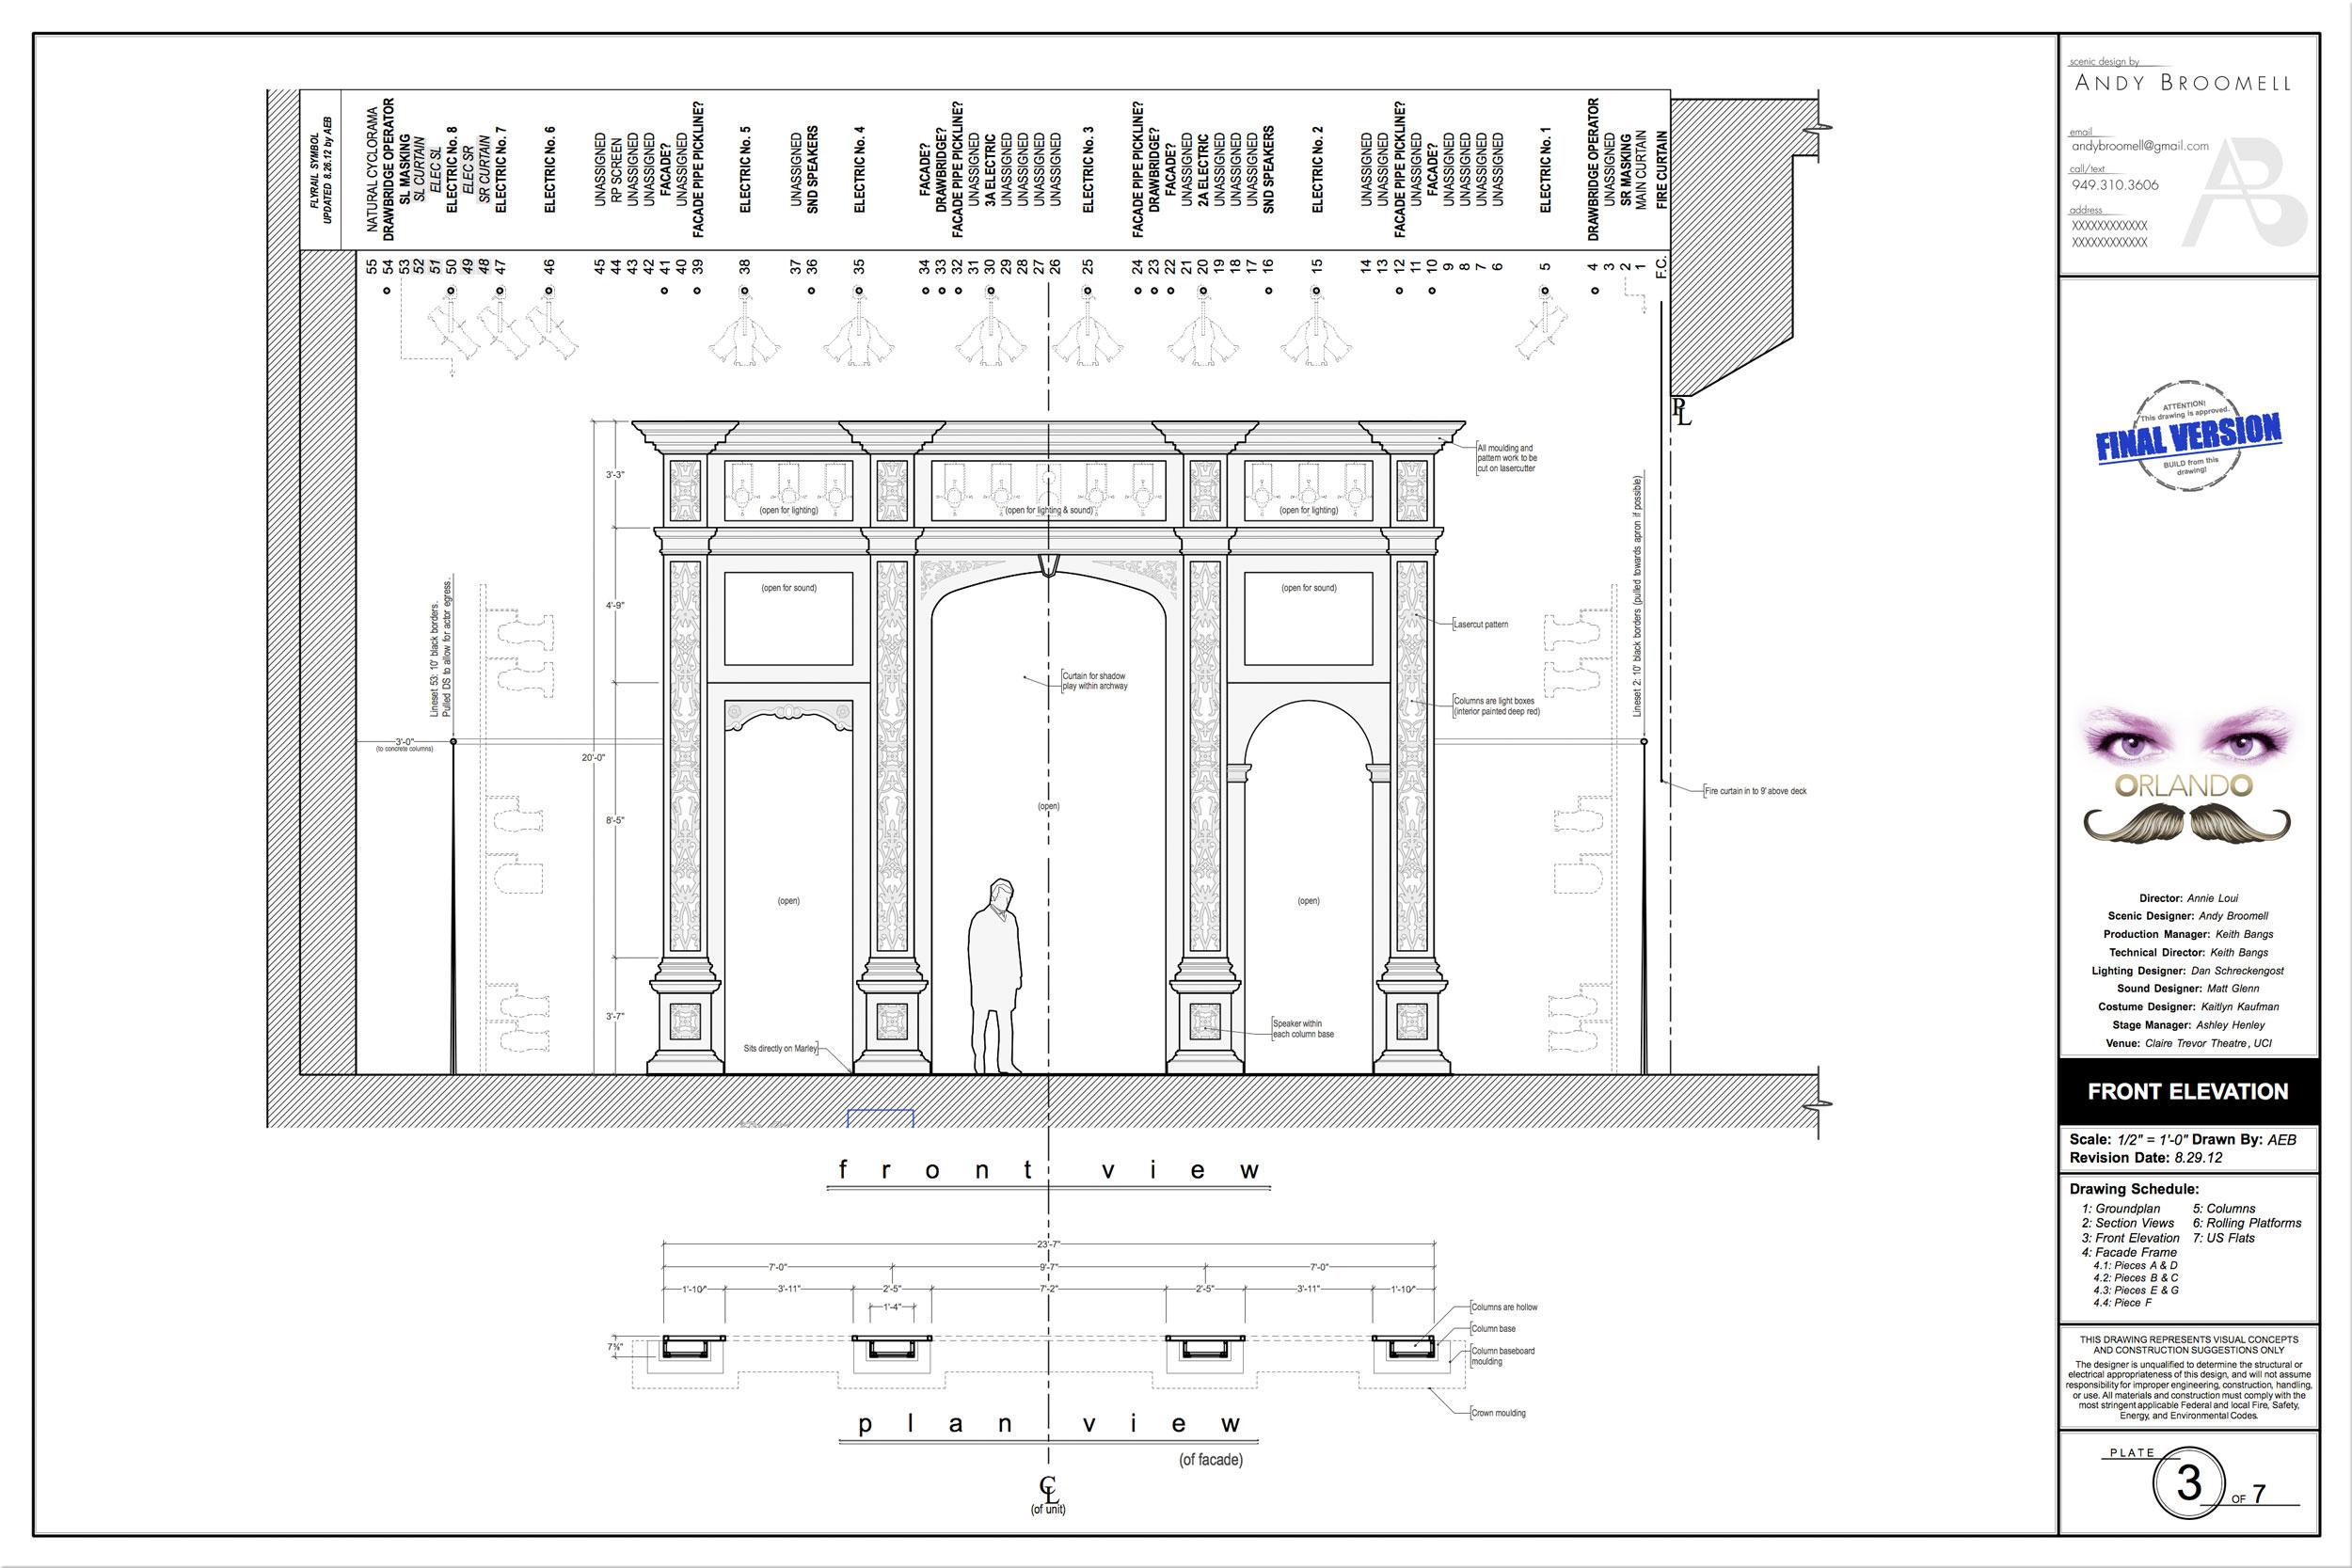 andy-broomell-scenic-design-drafting-orlando-3.jpg